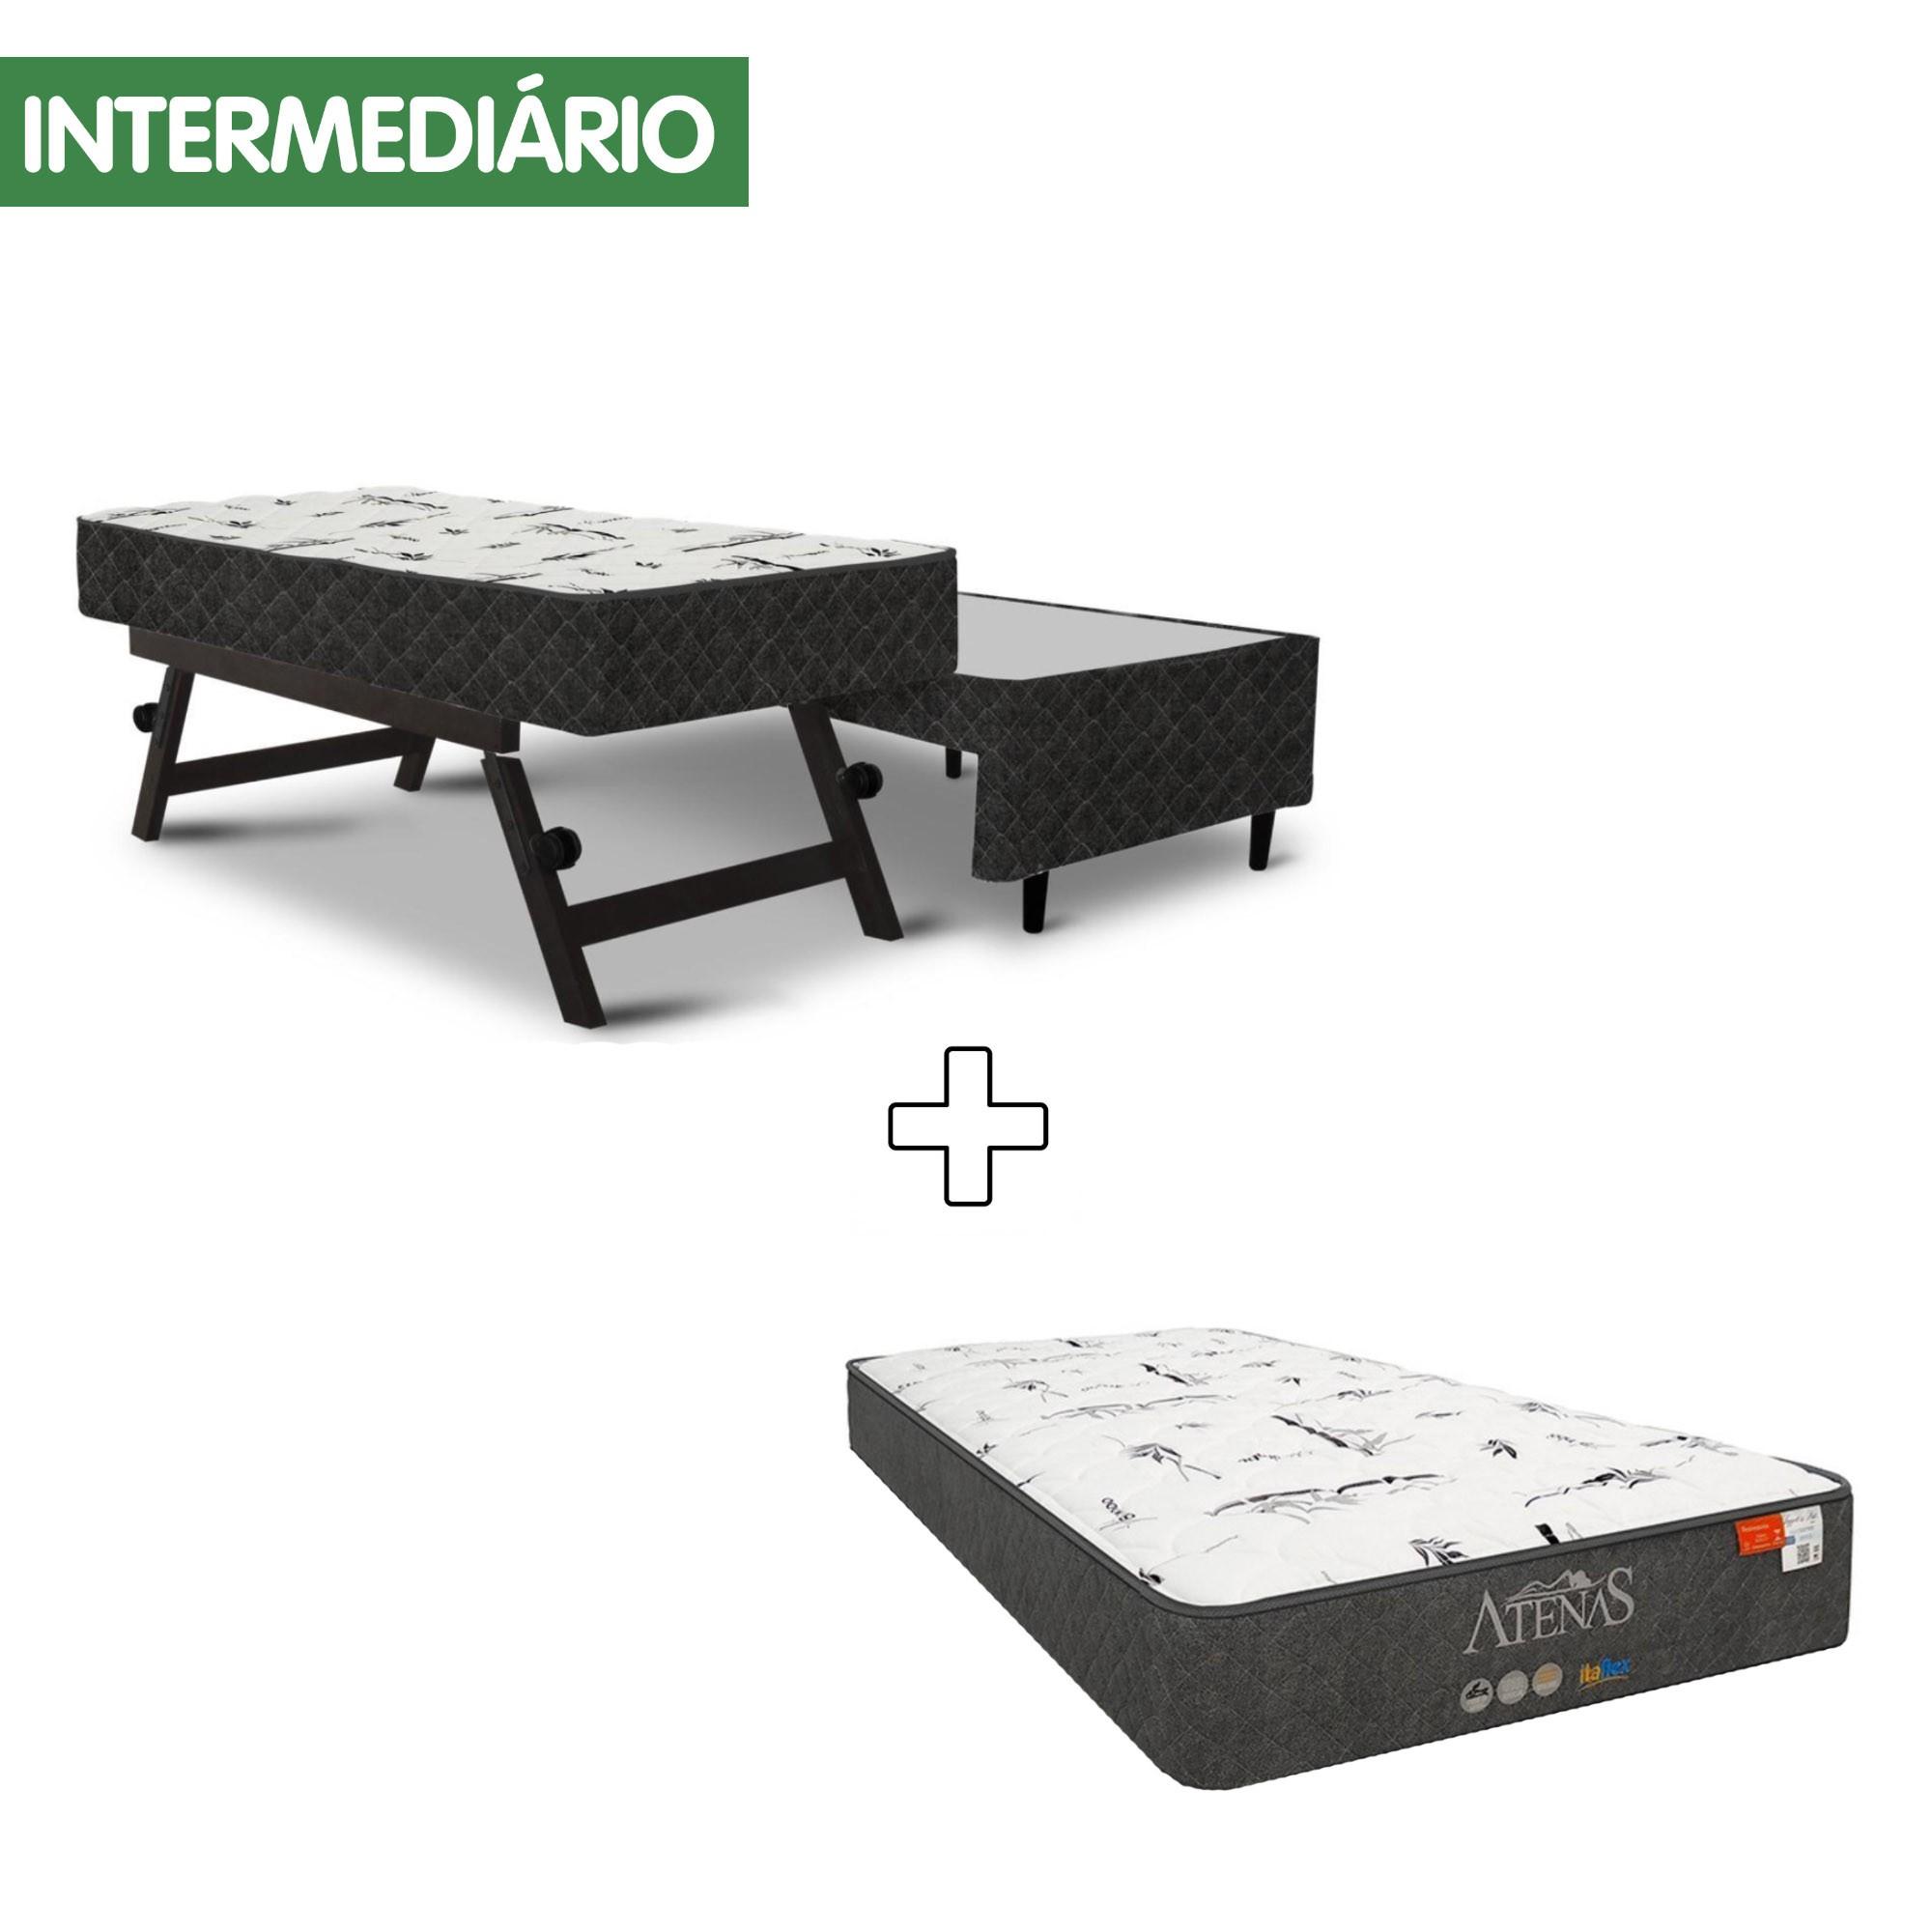 Conjunto Box Bicama Molejo Versátil Black + Colchão Atenas Black MGA [Solteirão 096 x 203 cm]